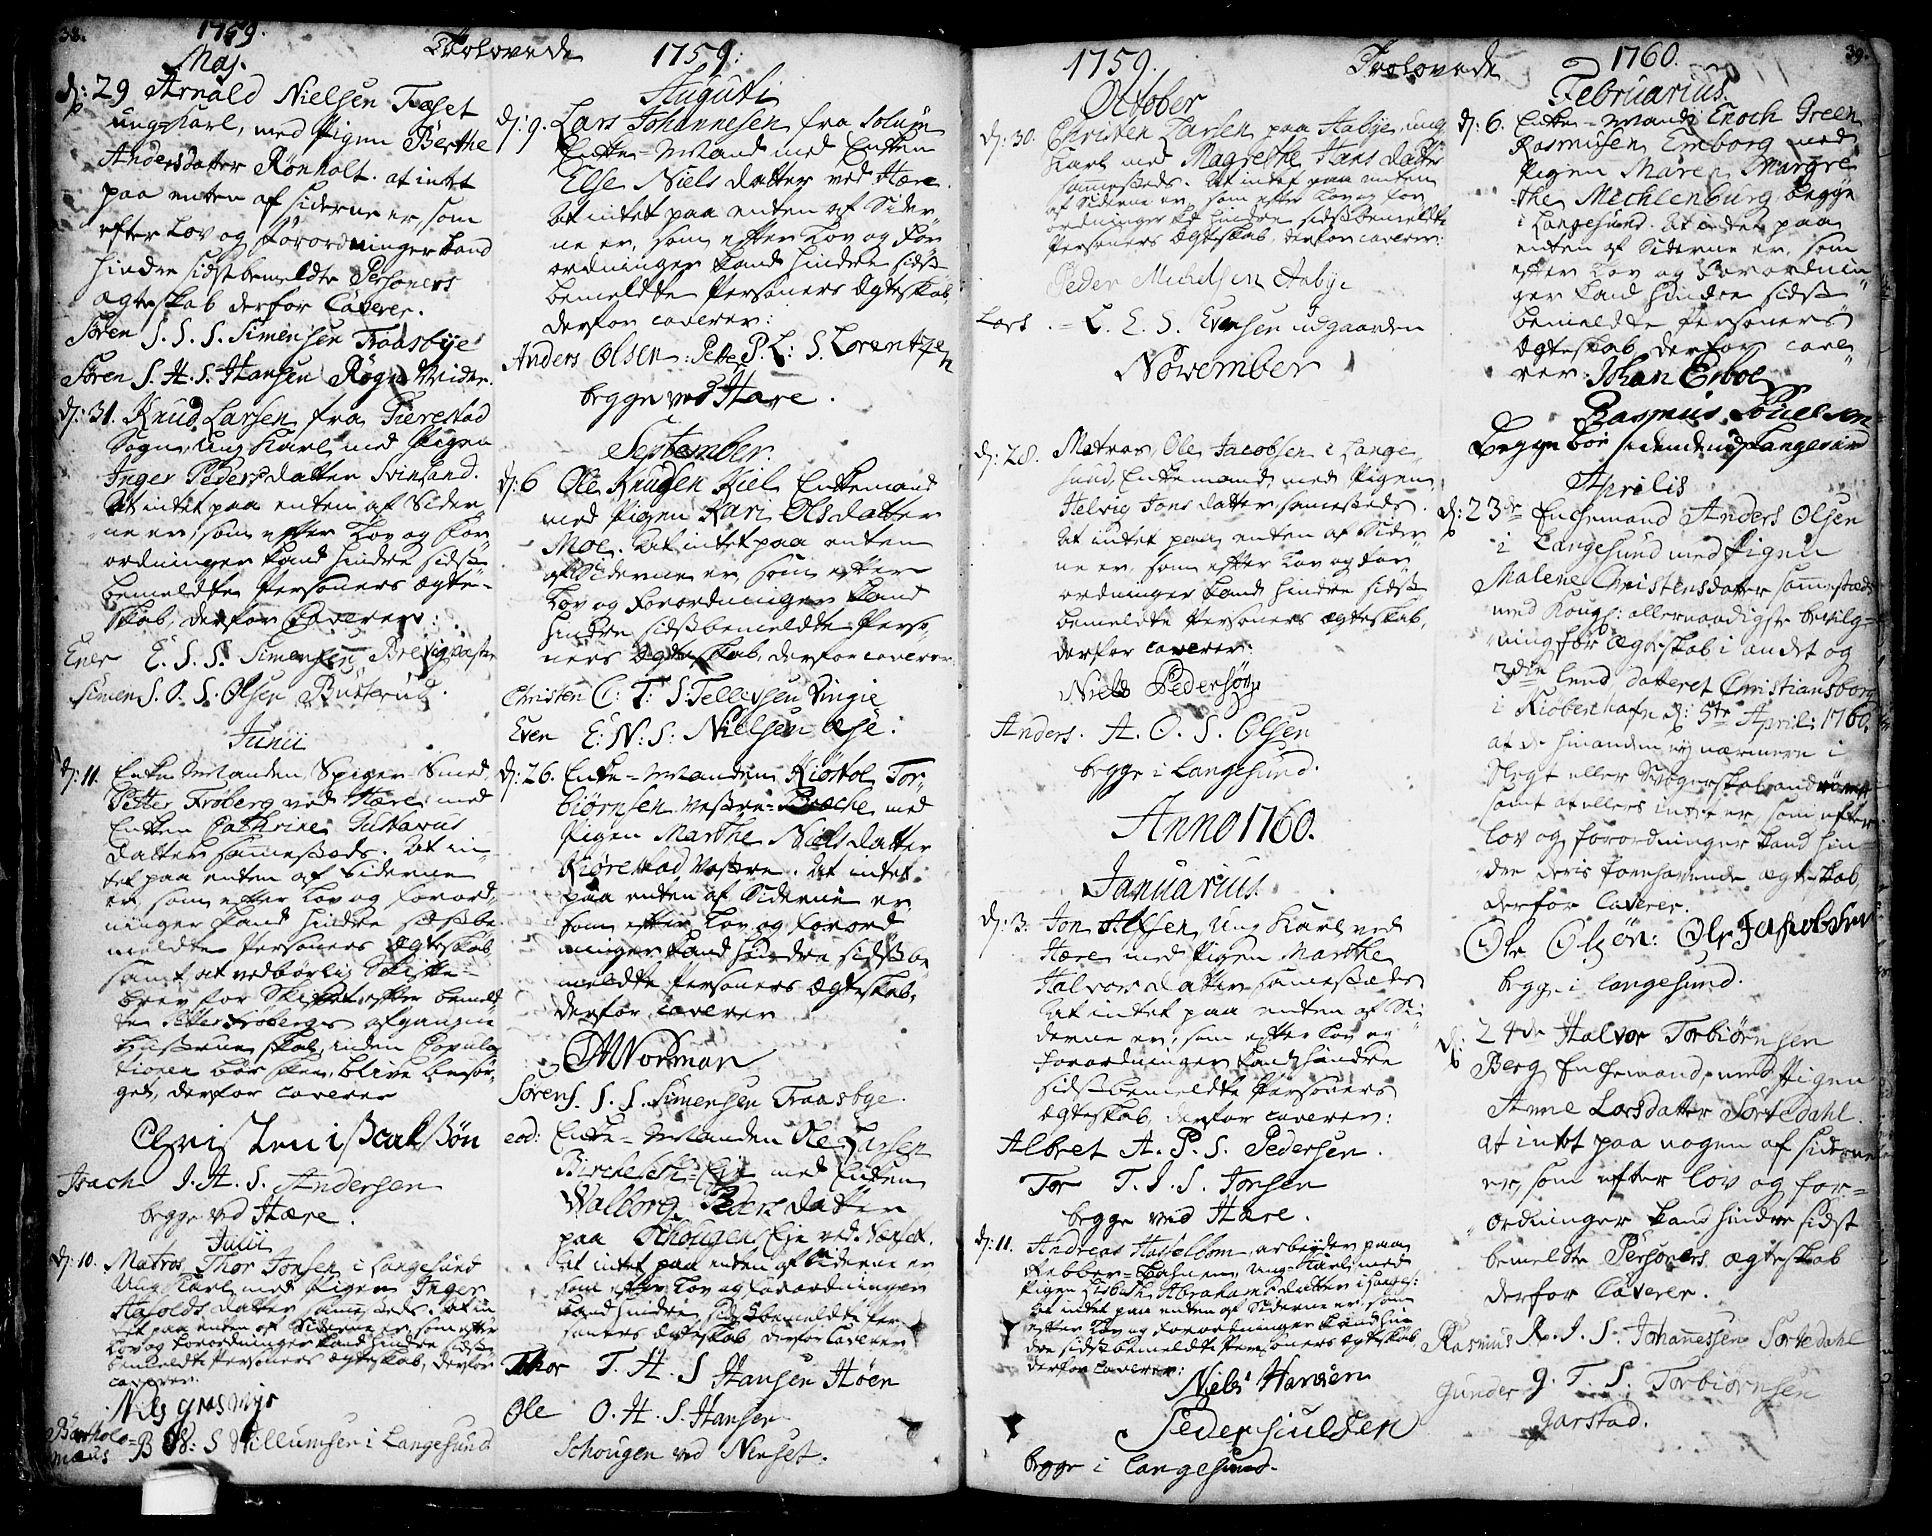 SAKO, Bamble kirkebøker, F/Fa/L0001: Ministerialbok nr. I 1, 1702-1774, s. 38-39